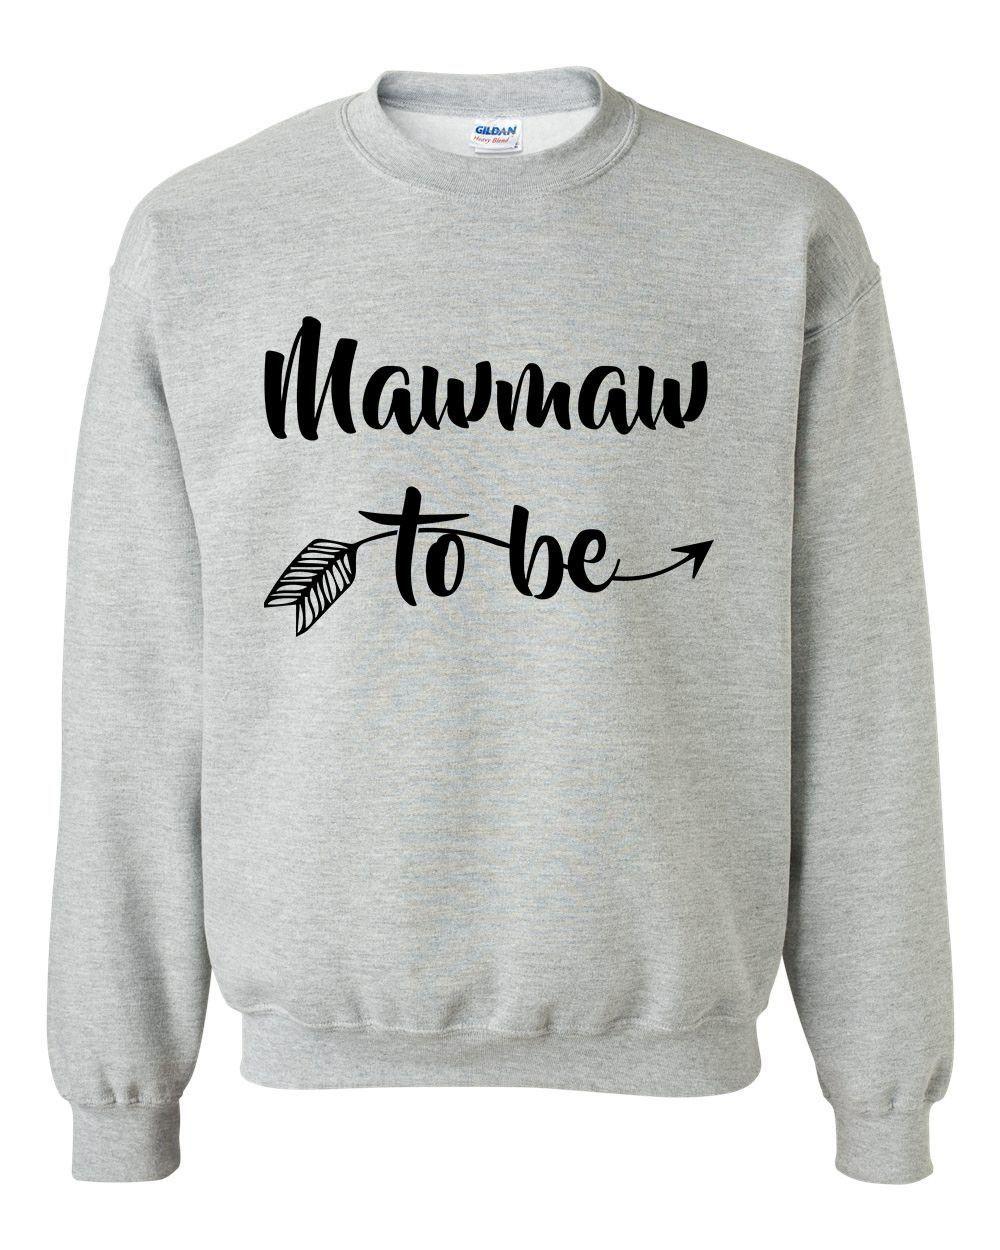 Mawmaw To Be Sweatshirt Grandparents Gifts Birthday Shirt Gift Tees Grandma Grandmother Tshirt